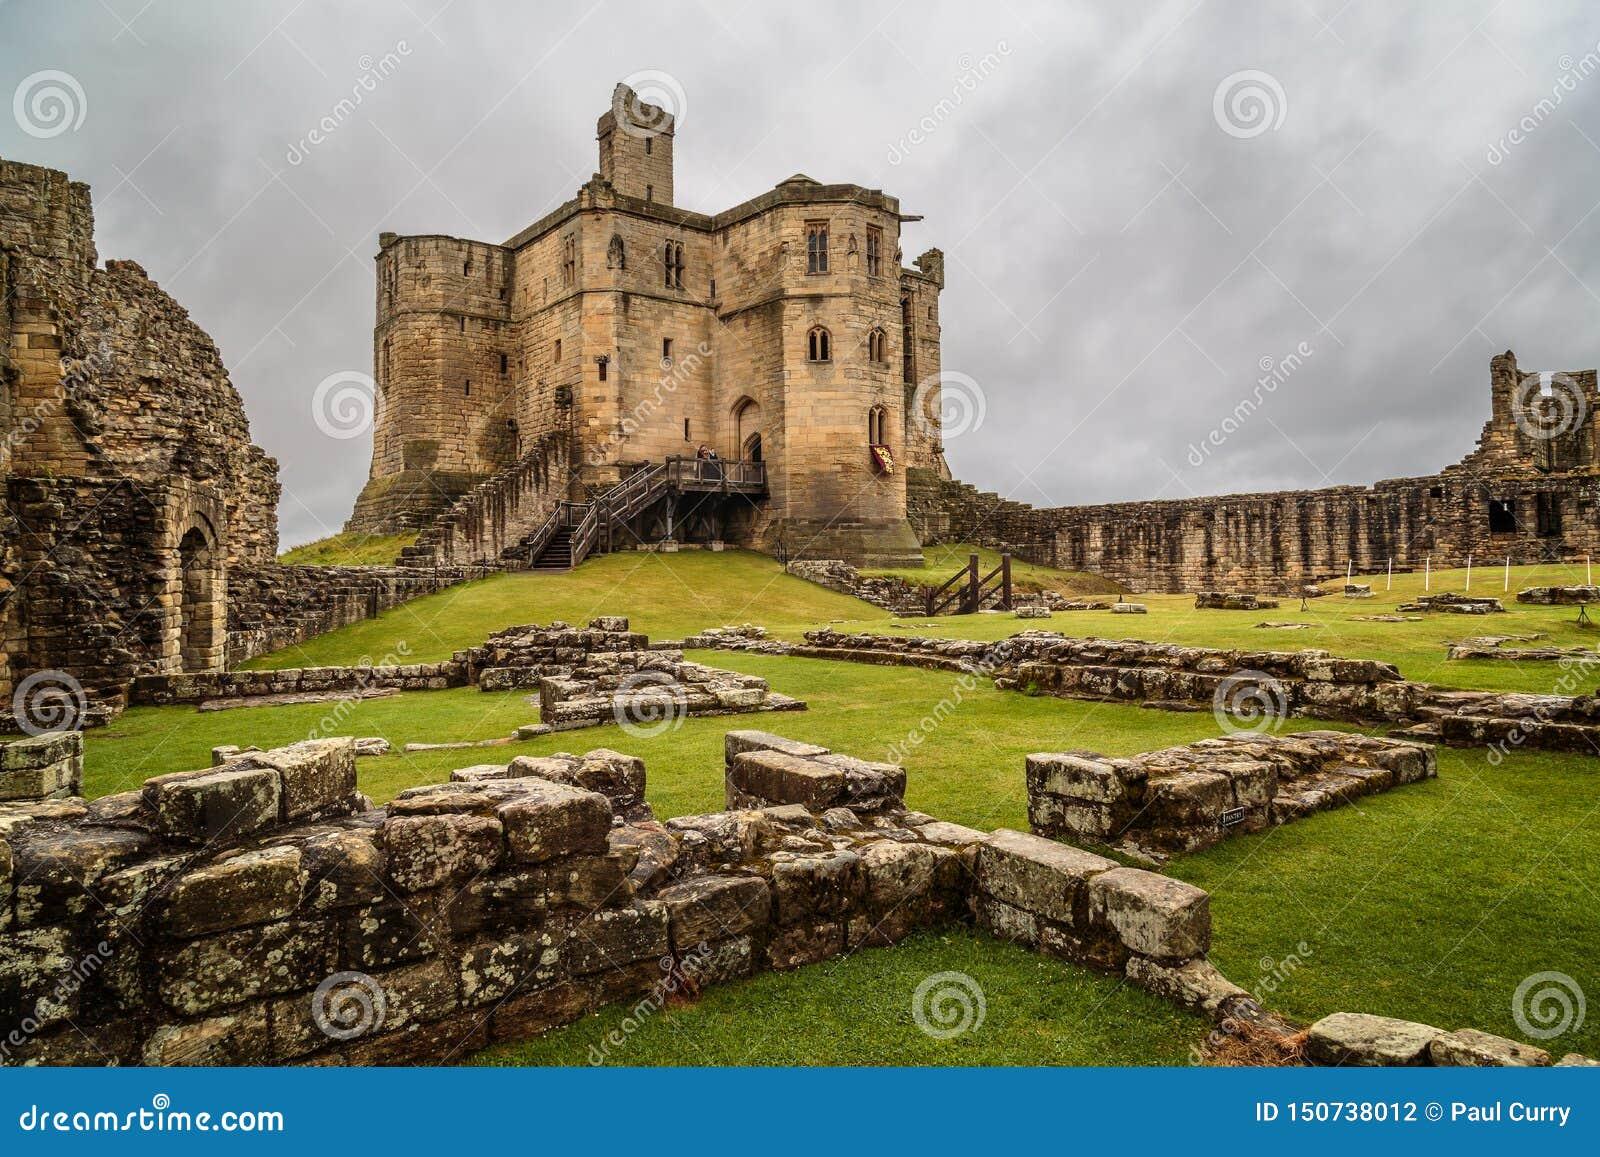 Medievel ruinent le château de Warkworth du Northumberland